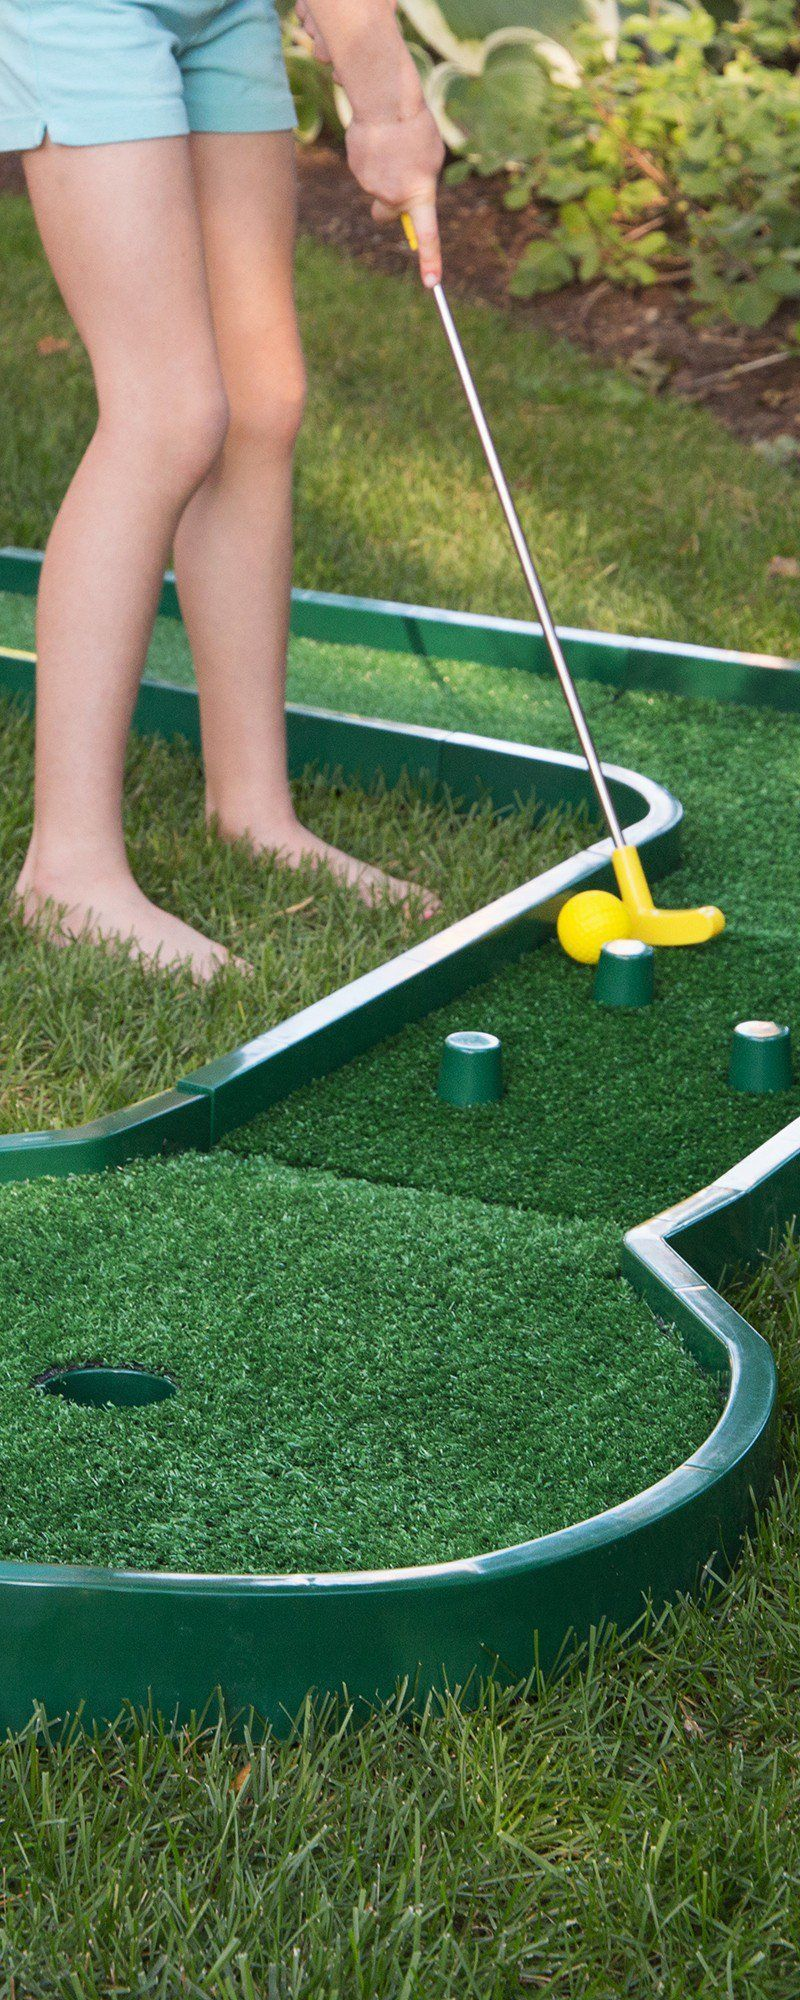 Interchangeable Putting Set Mini Golf Set Mini Golf Course Mini Golf